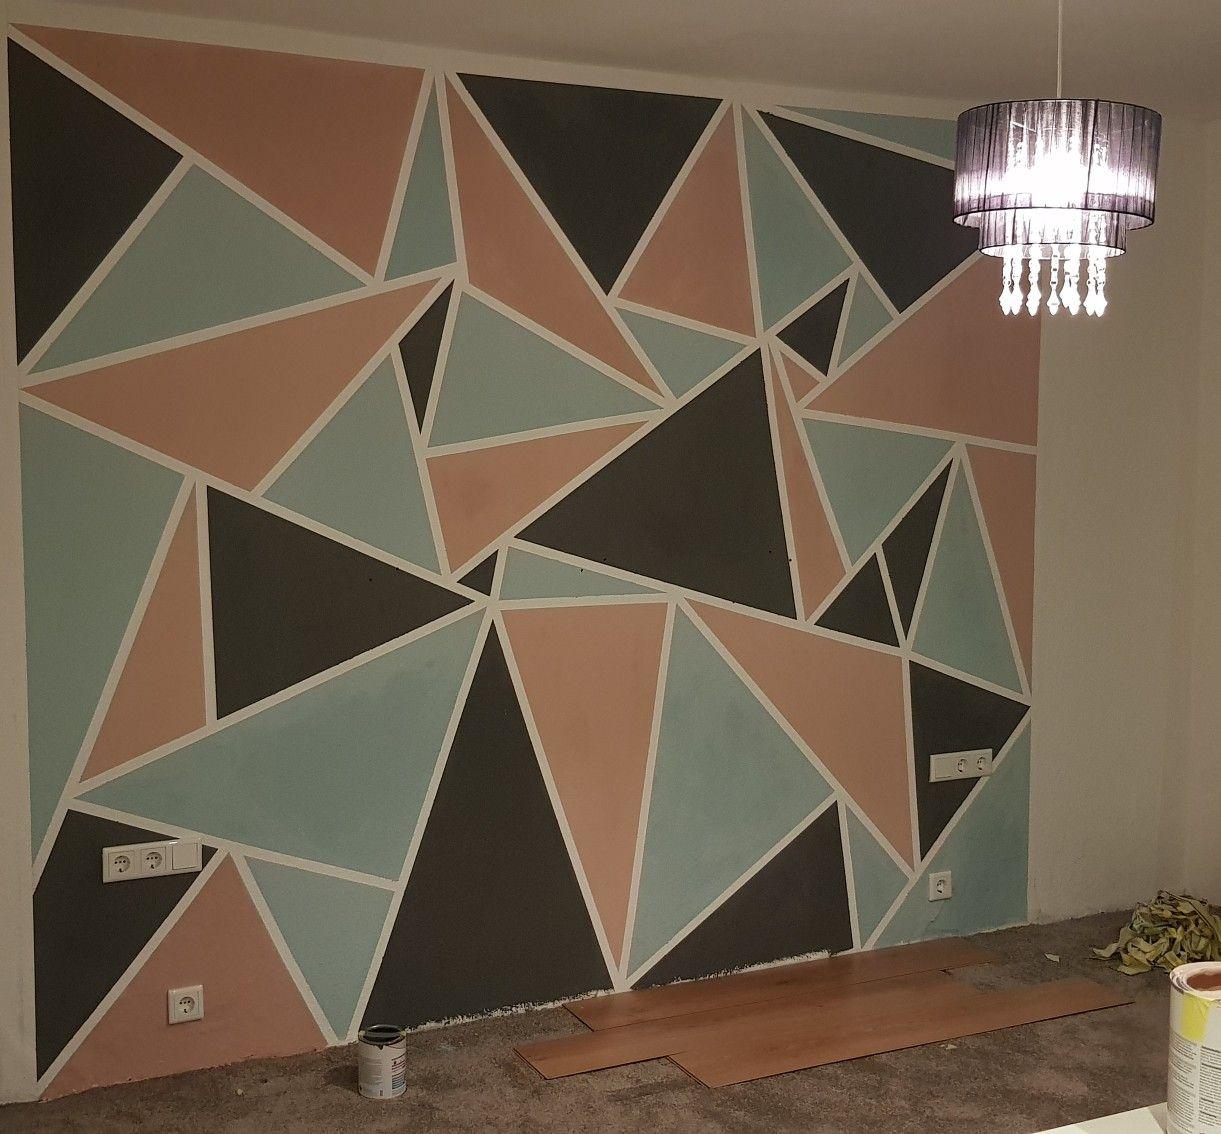 Wand Streichen Dreieck Wandgestaltung Dreiecke Wände Streichen Wandgestaltung Design